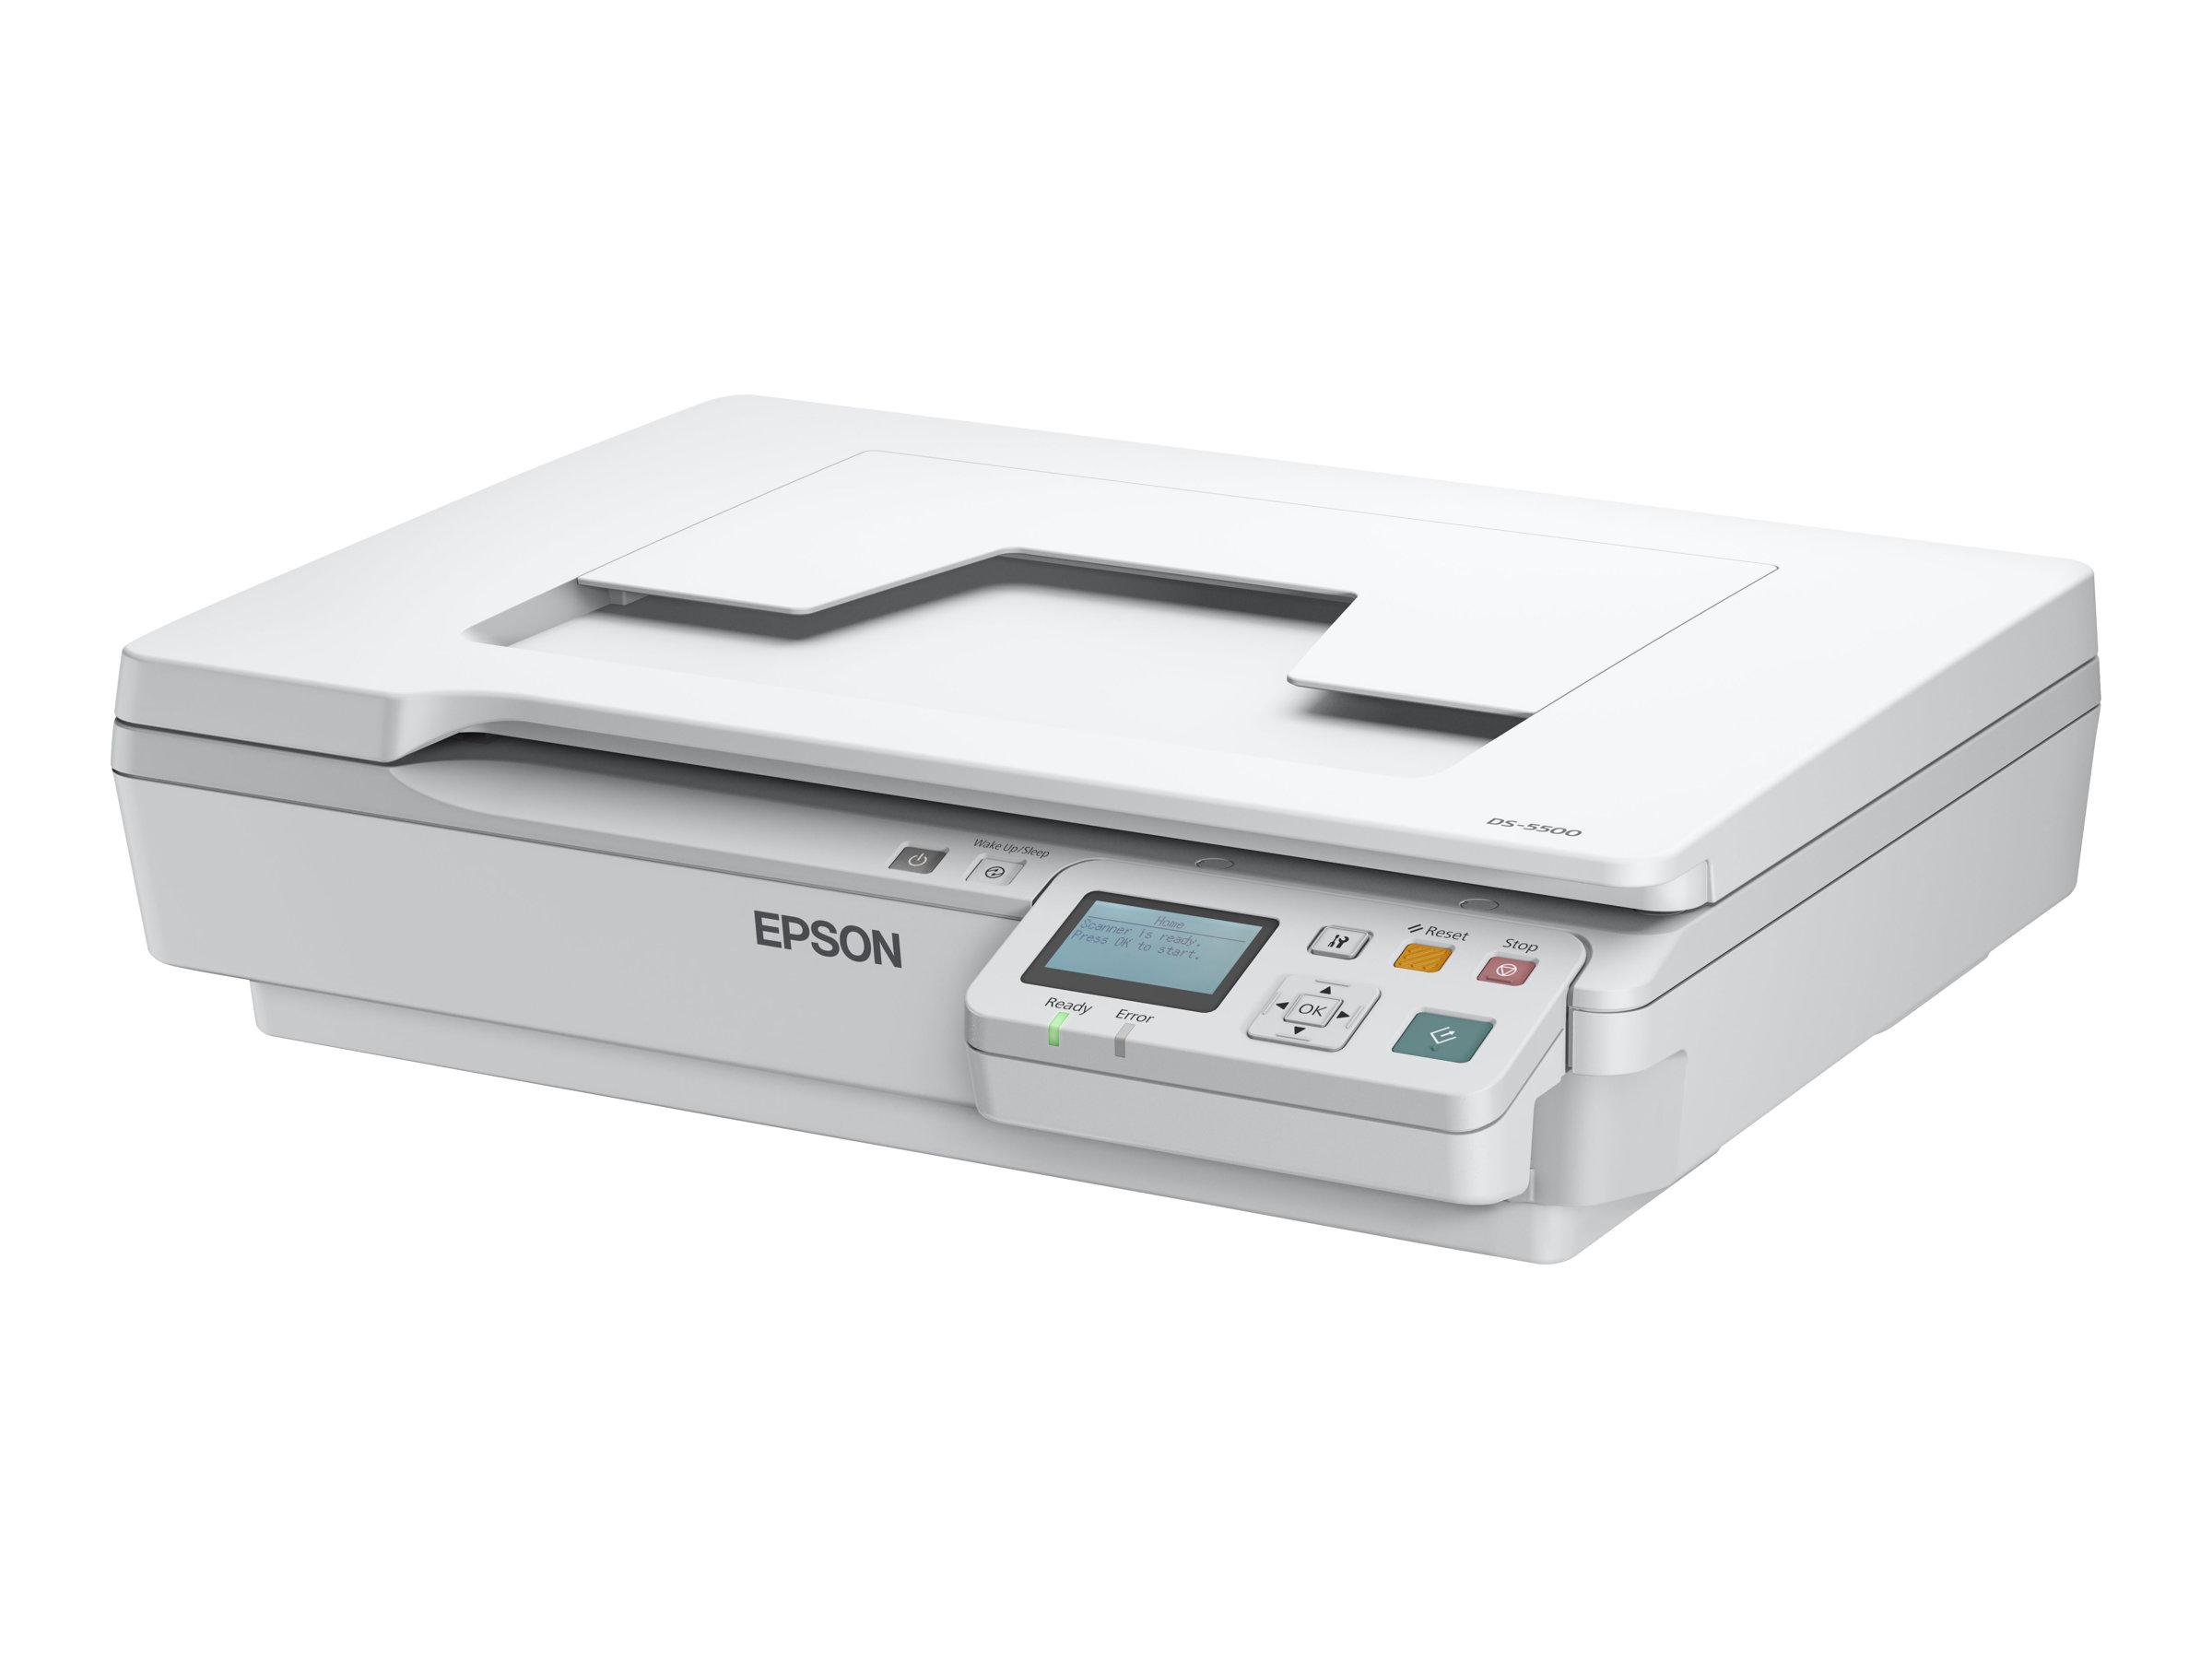 Epson WorkForce DS-5500N - Flachbettscanner - A4 - 1200 dpi x 1200 dpi - USB 2.0, LAN